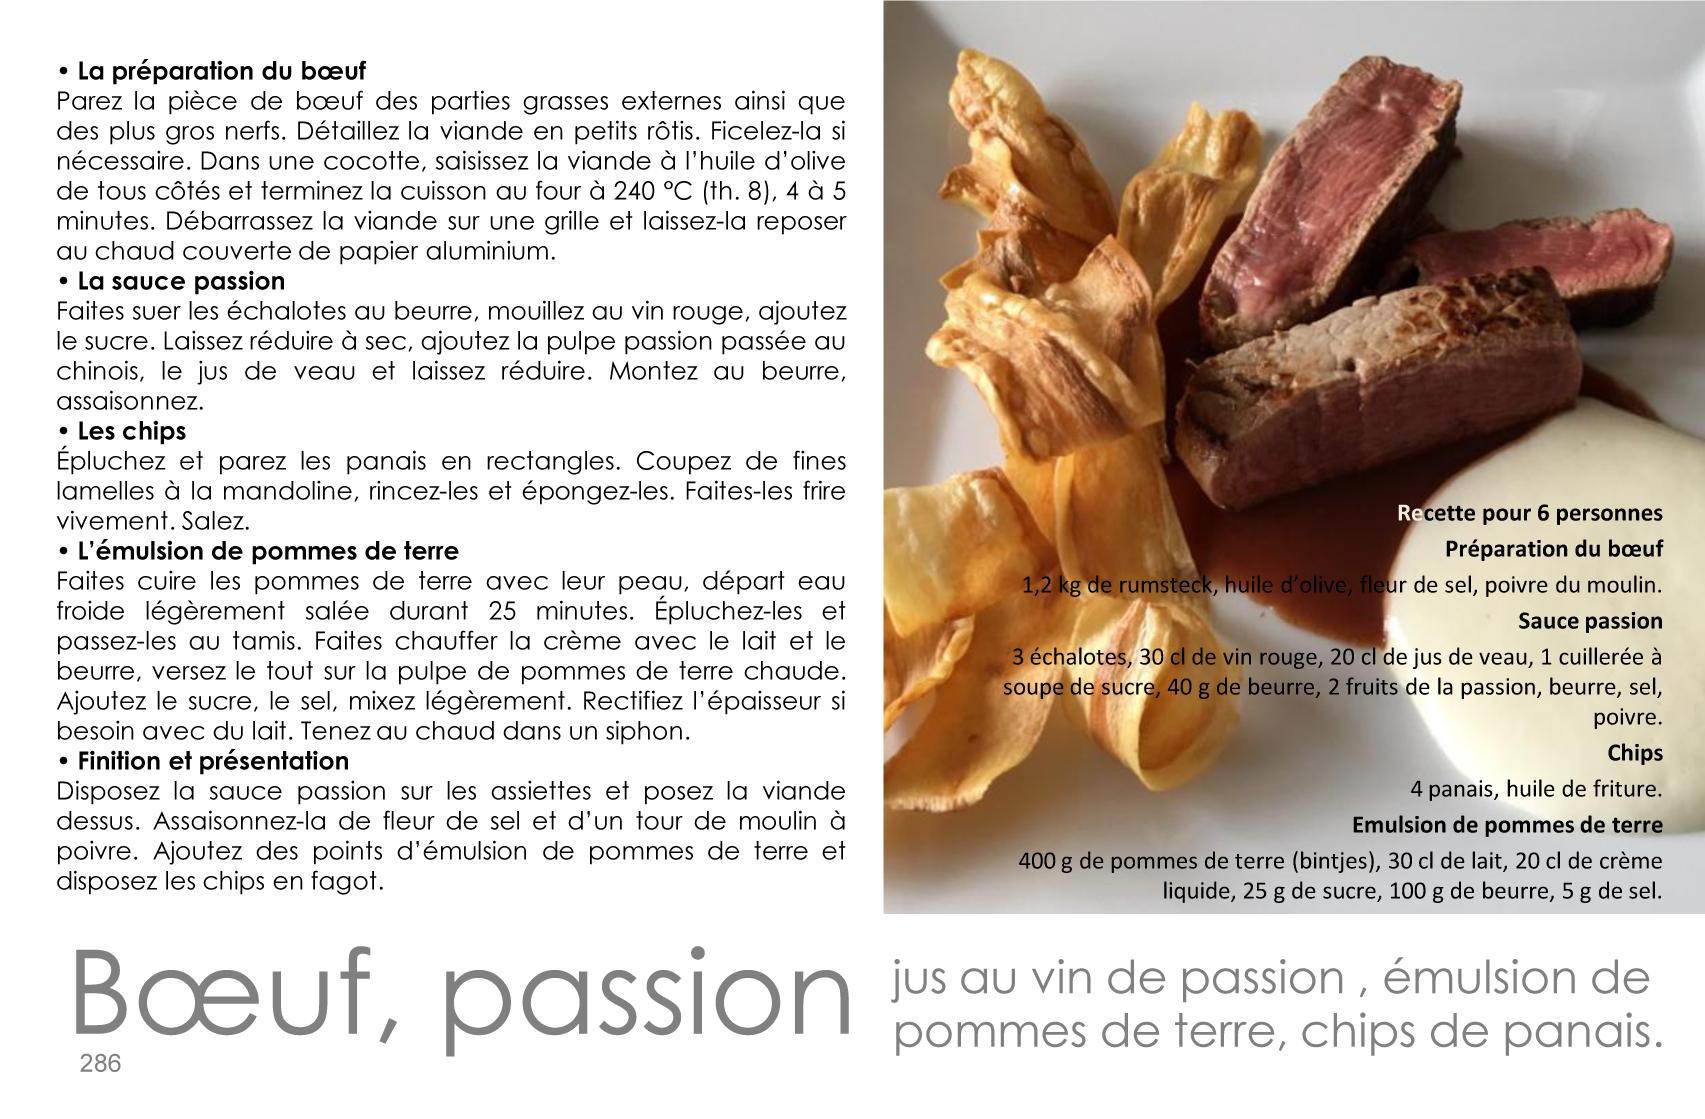 Boeuf, sauce passion